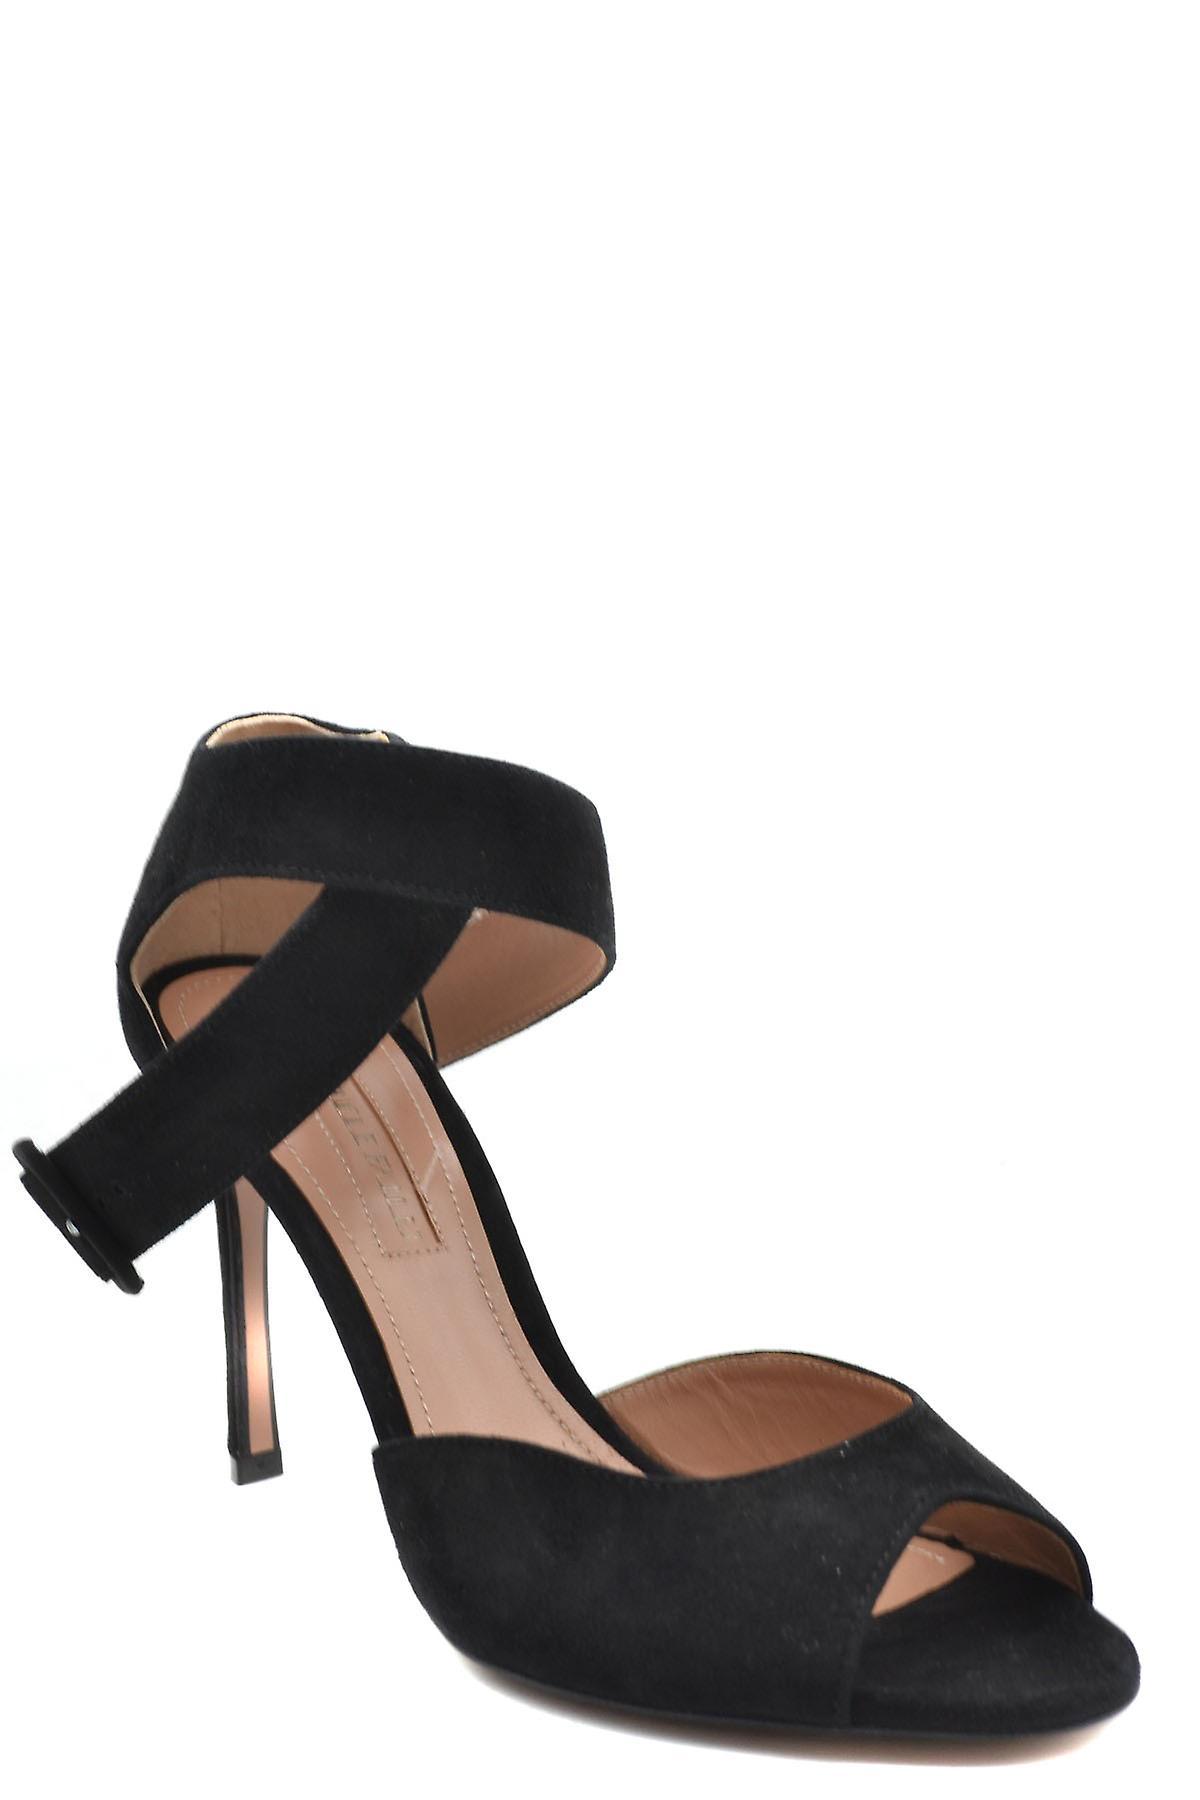 Samuele Failli Ezbc444001 Women's Black Suede Sandals i5Kxlc